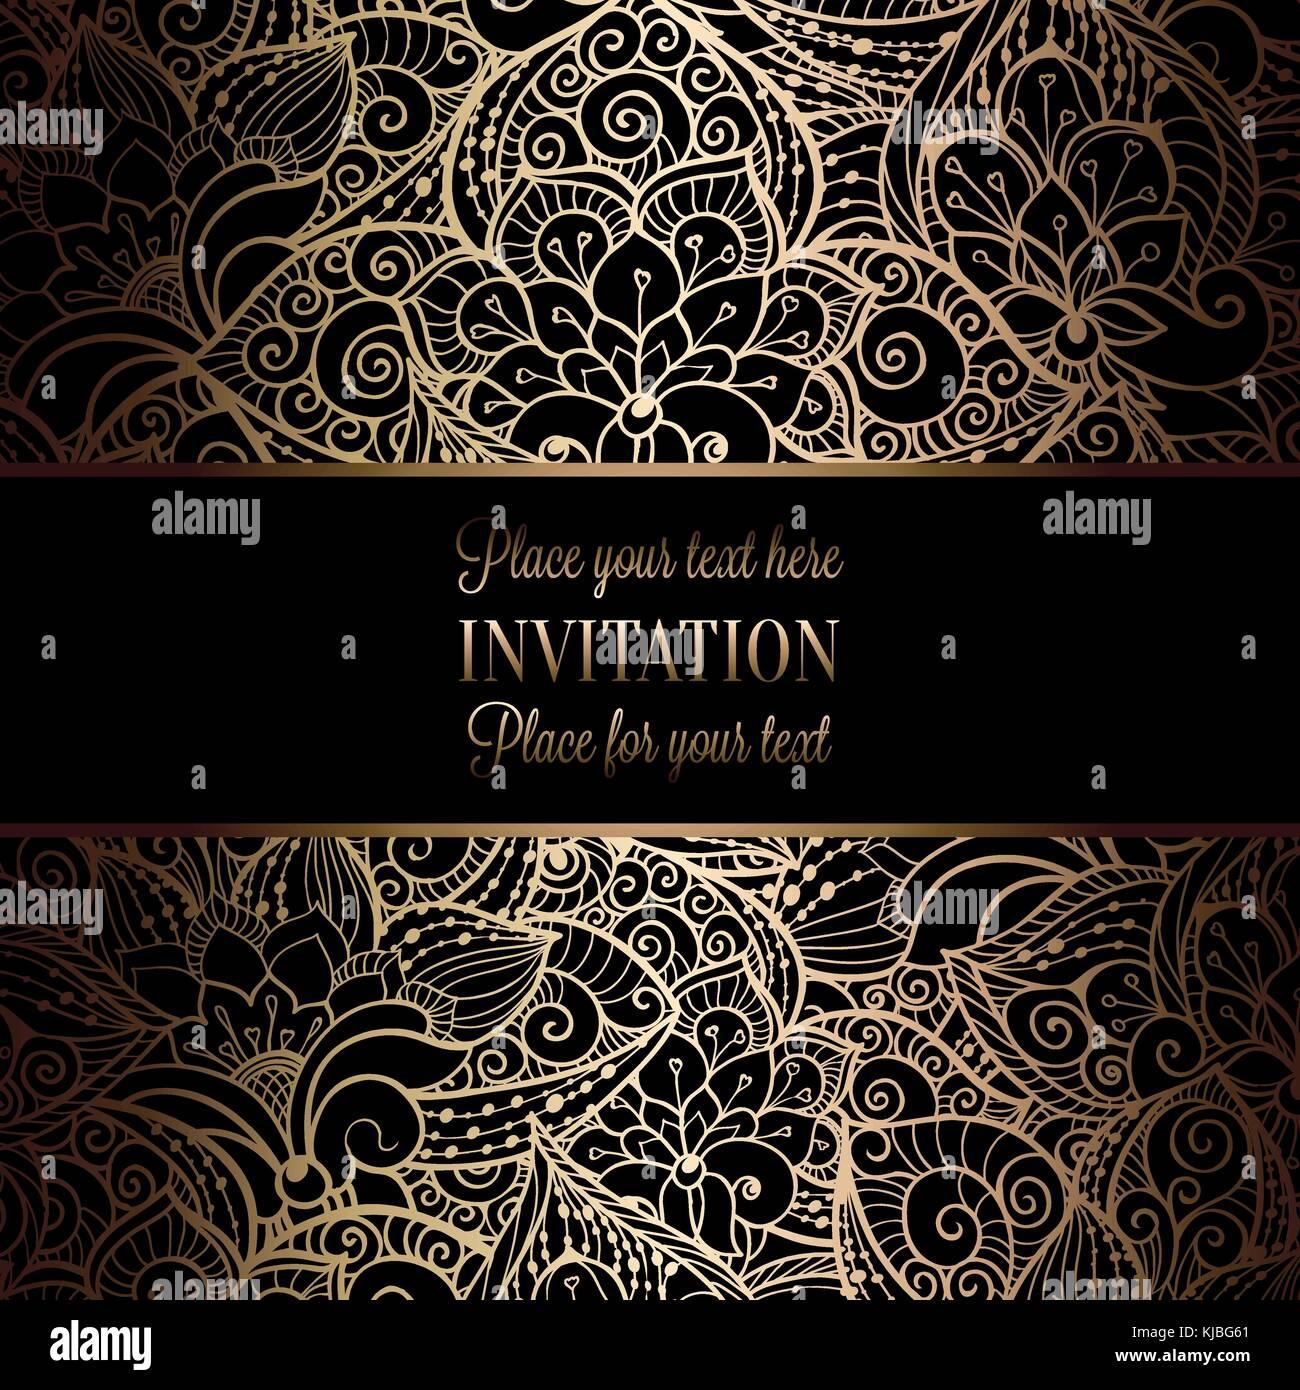 vintage baroque wedding invitation template with damask background